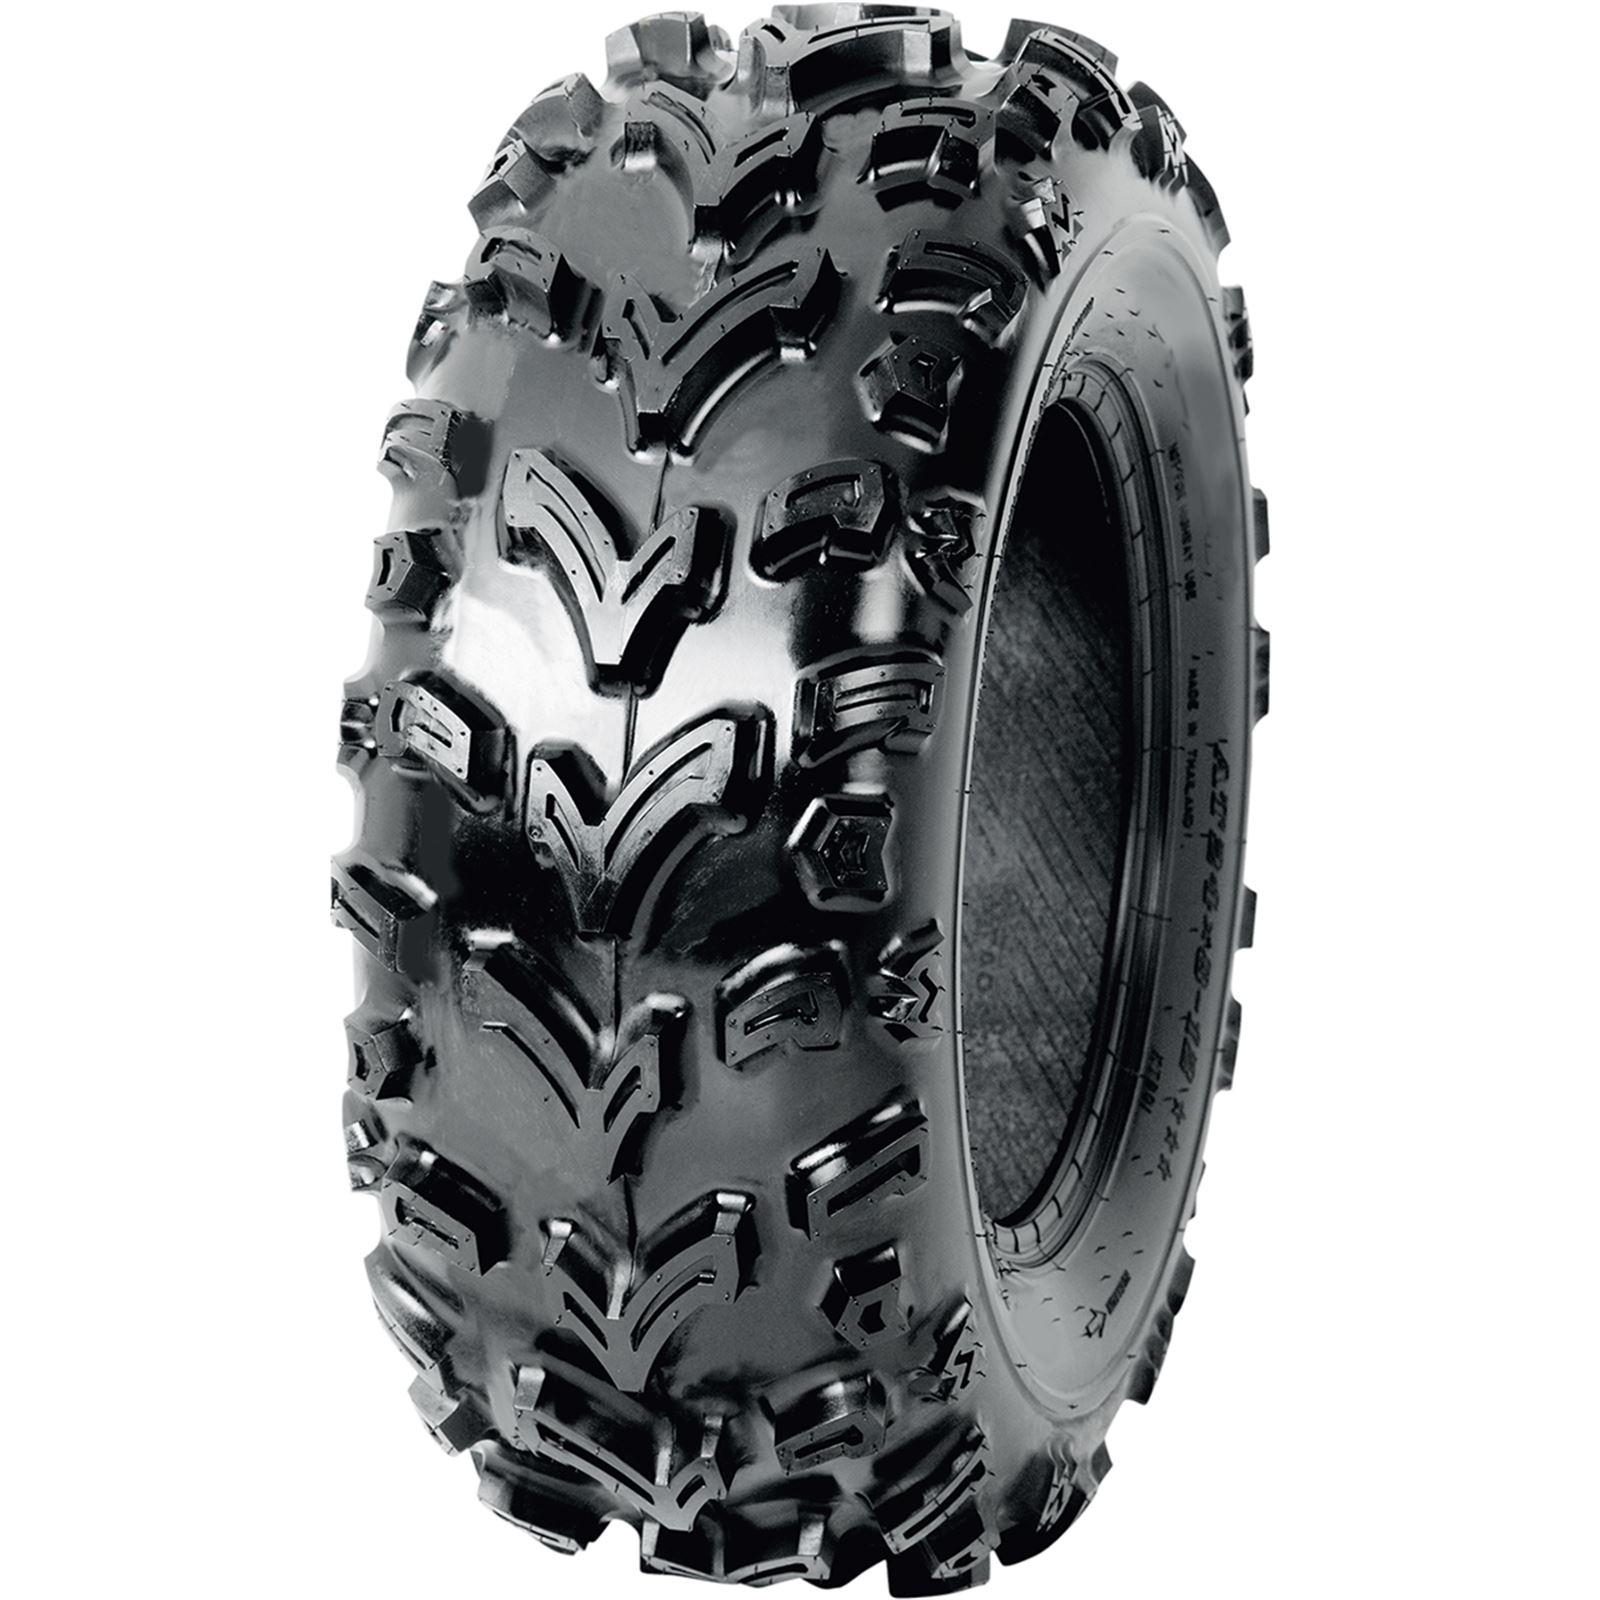 Duro Tire Tire - DIK108 - 25X8-12 - 6 Ply